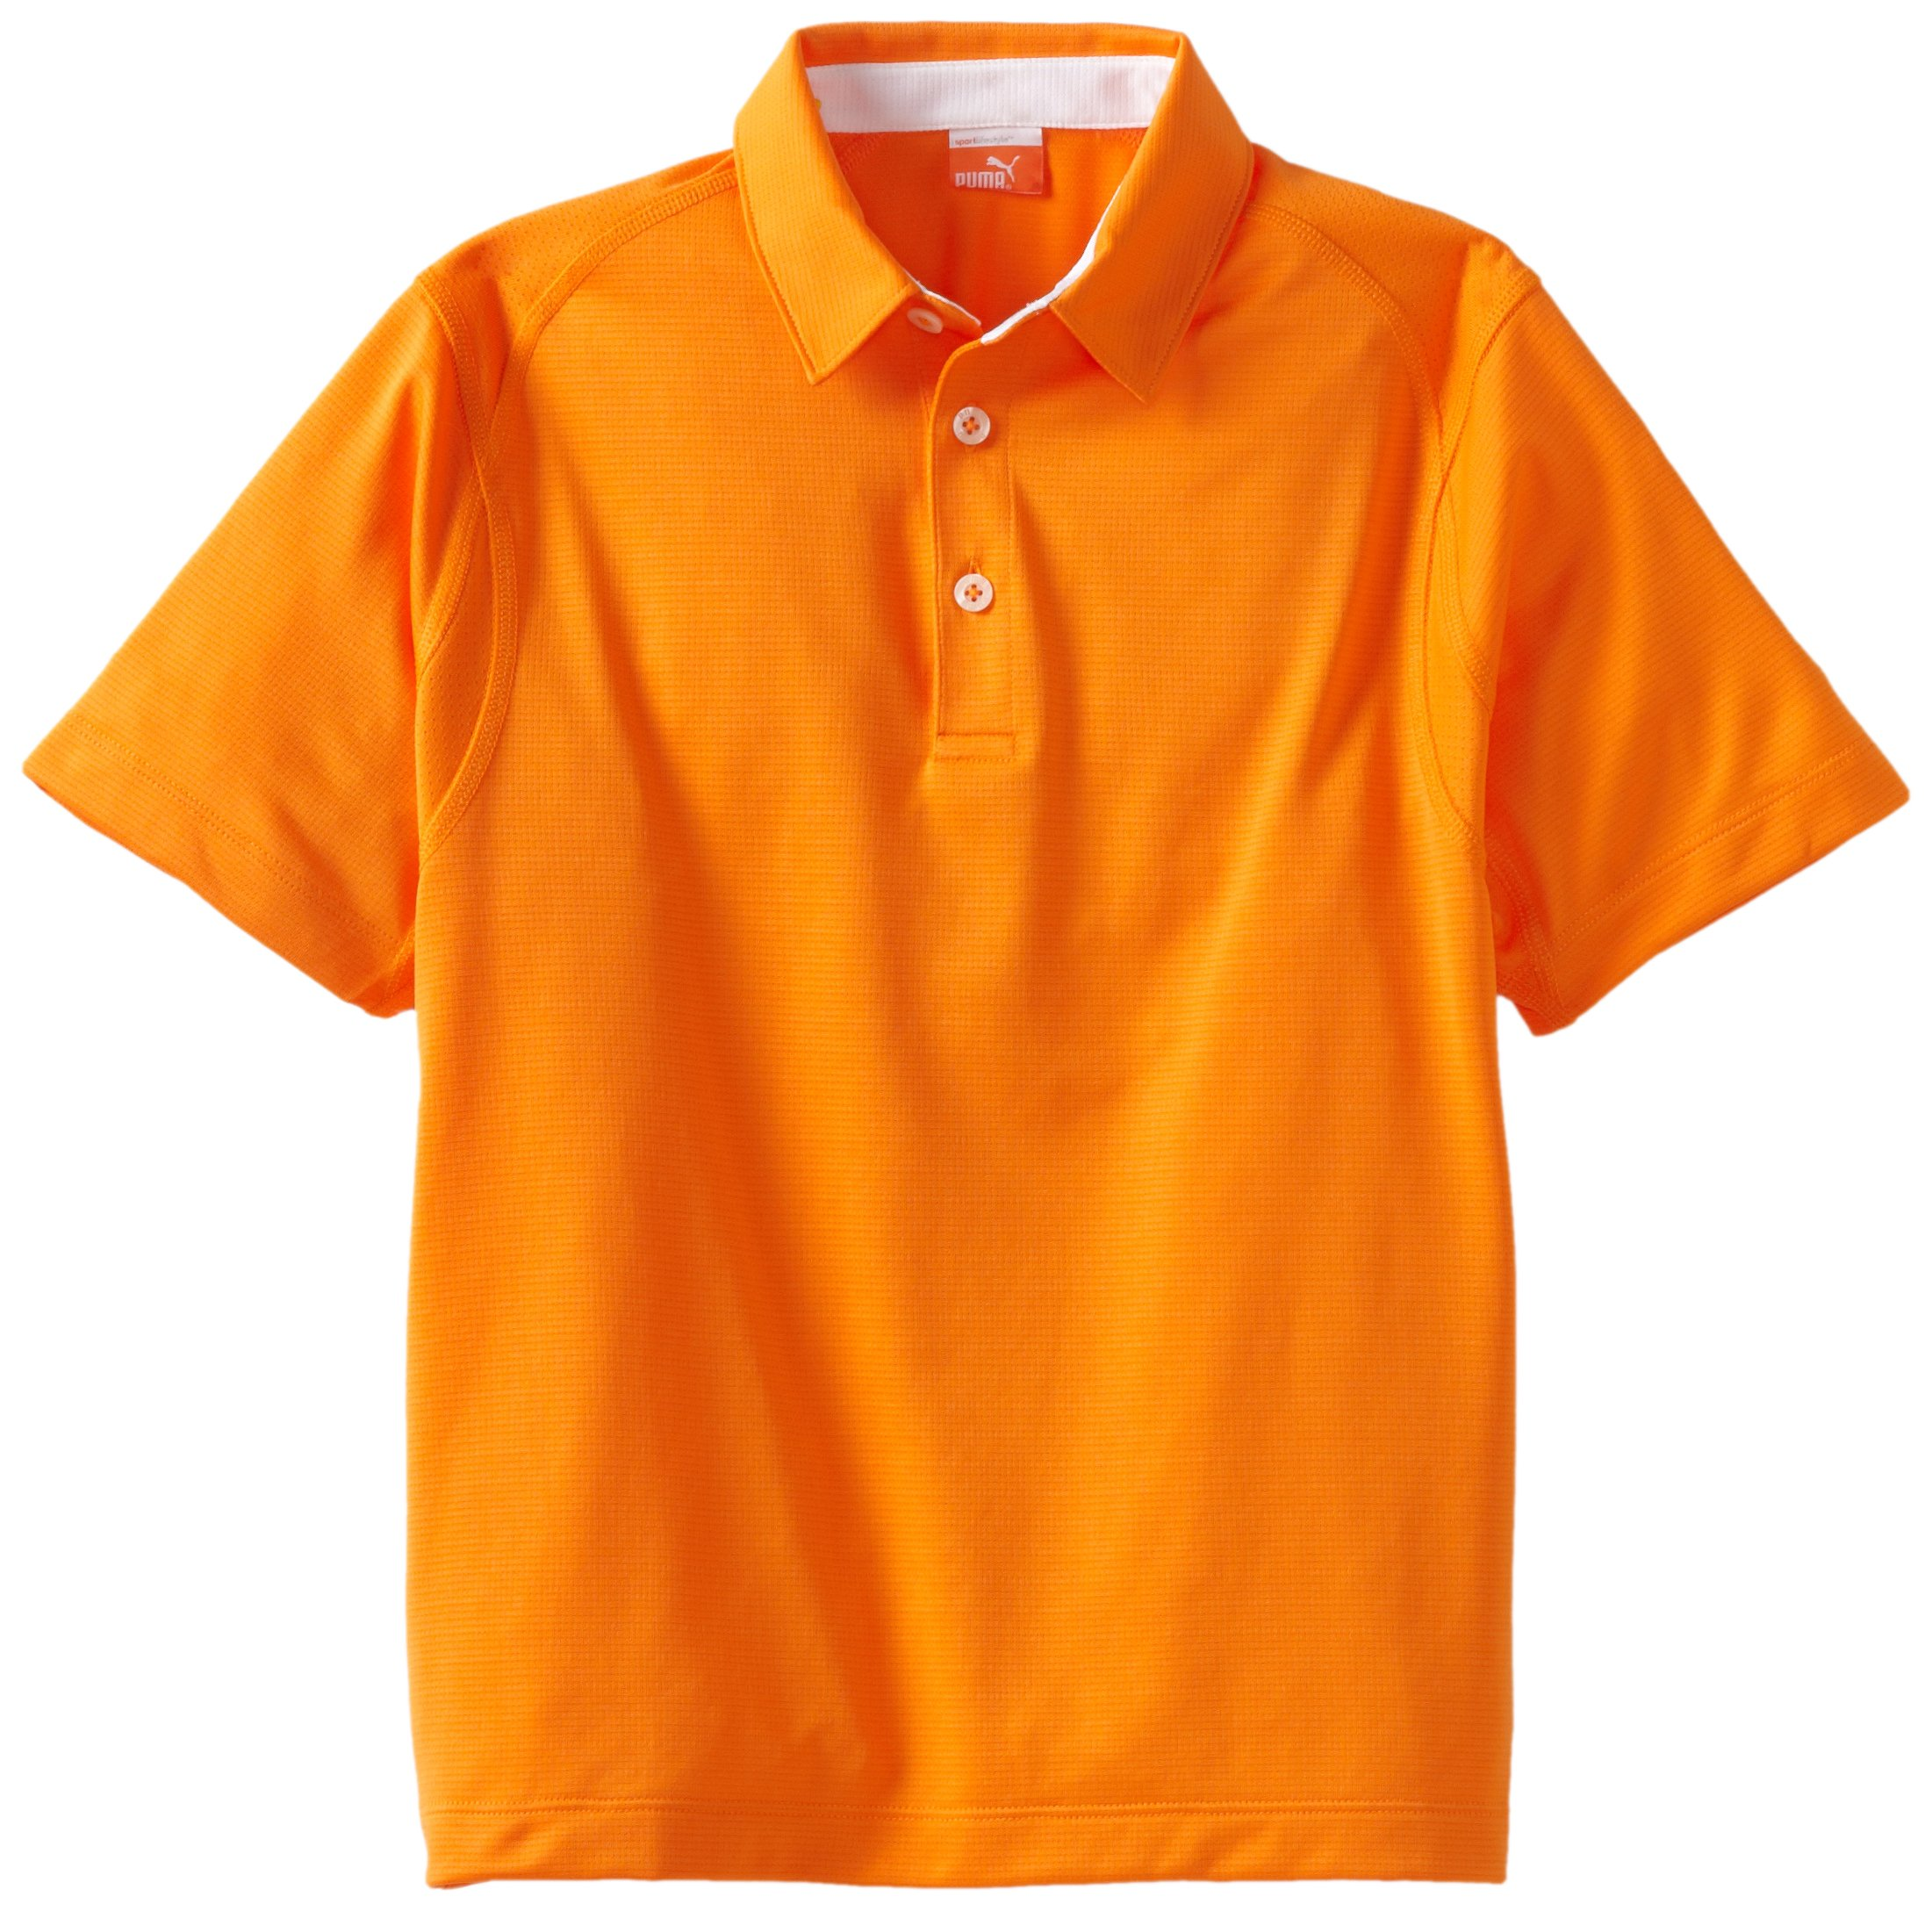 Puma Golf Boy's Tech Polo Tee, Vibrant Orange, Large by PUMA